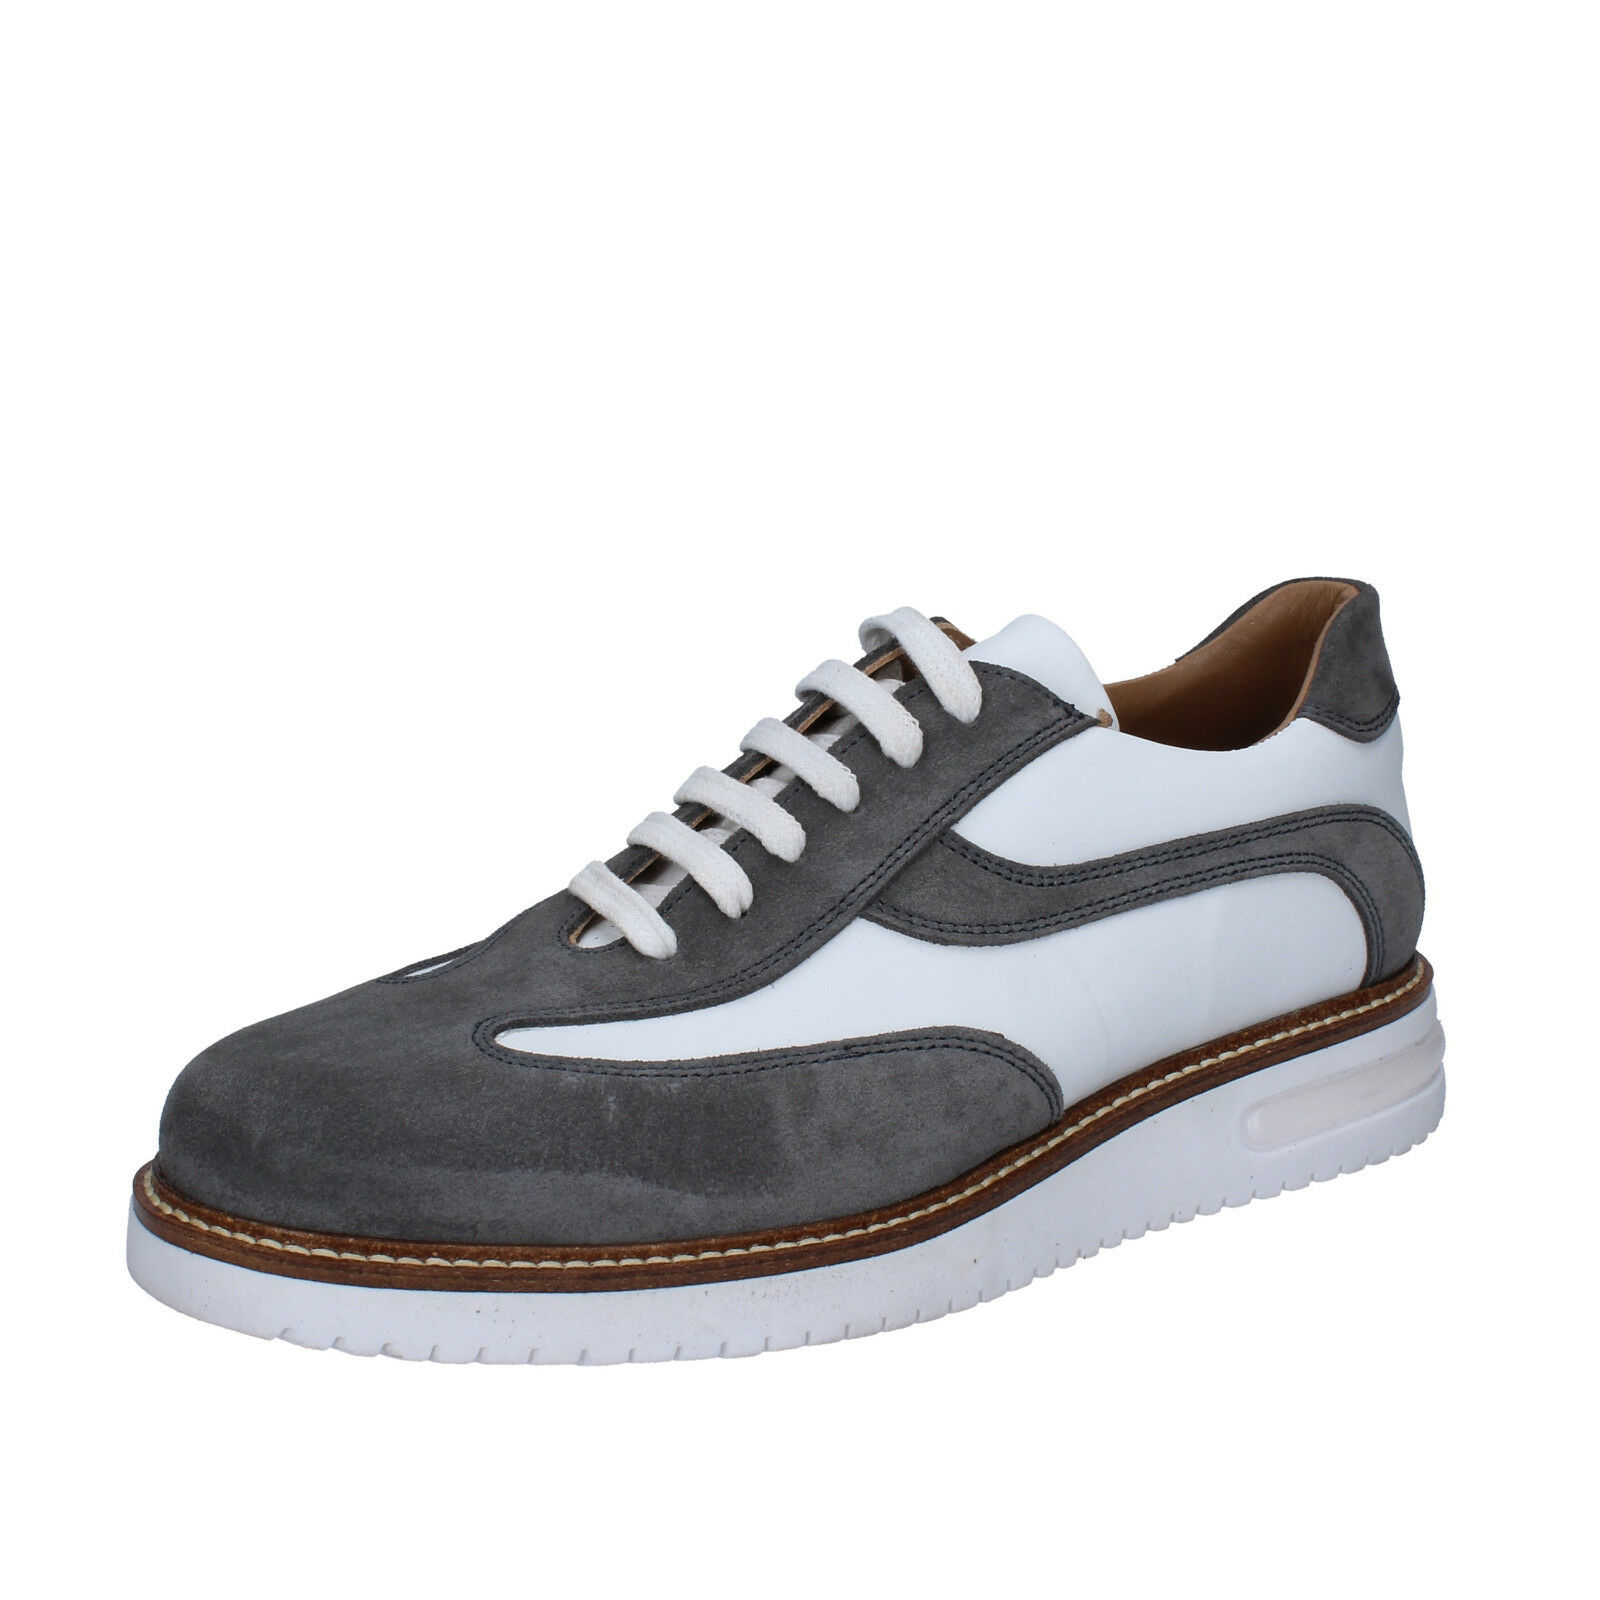 finest selection d92e2 47b14 FDF SHOES SHOES SHOES 41 EU classiche bianco grigio pelle camoscio BZ385-C  7e4902